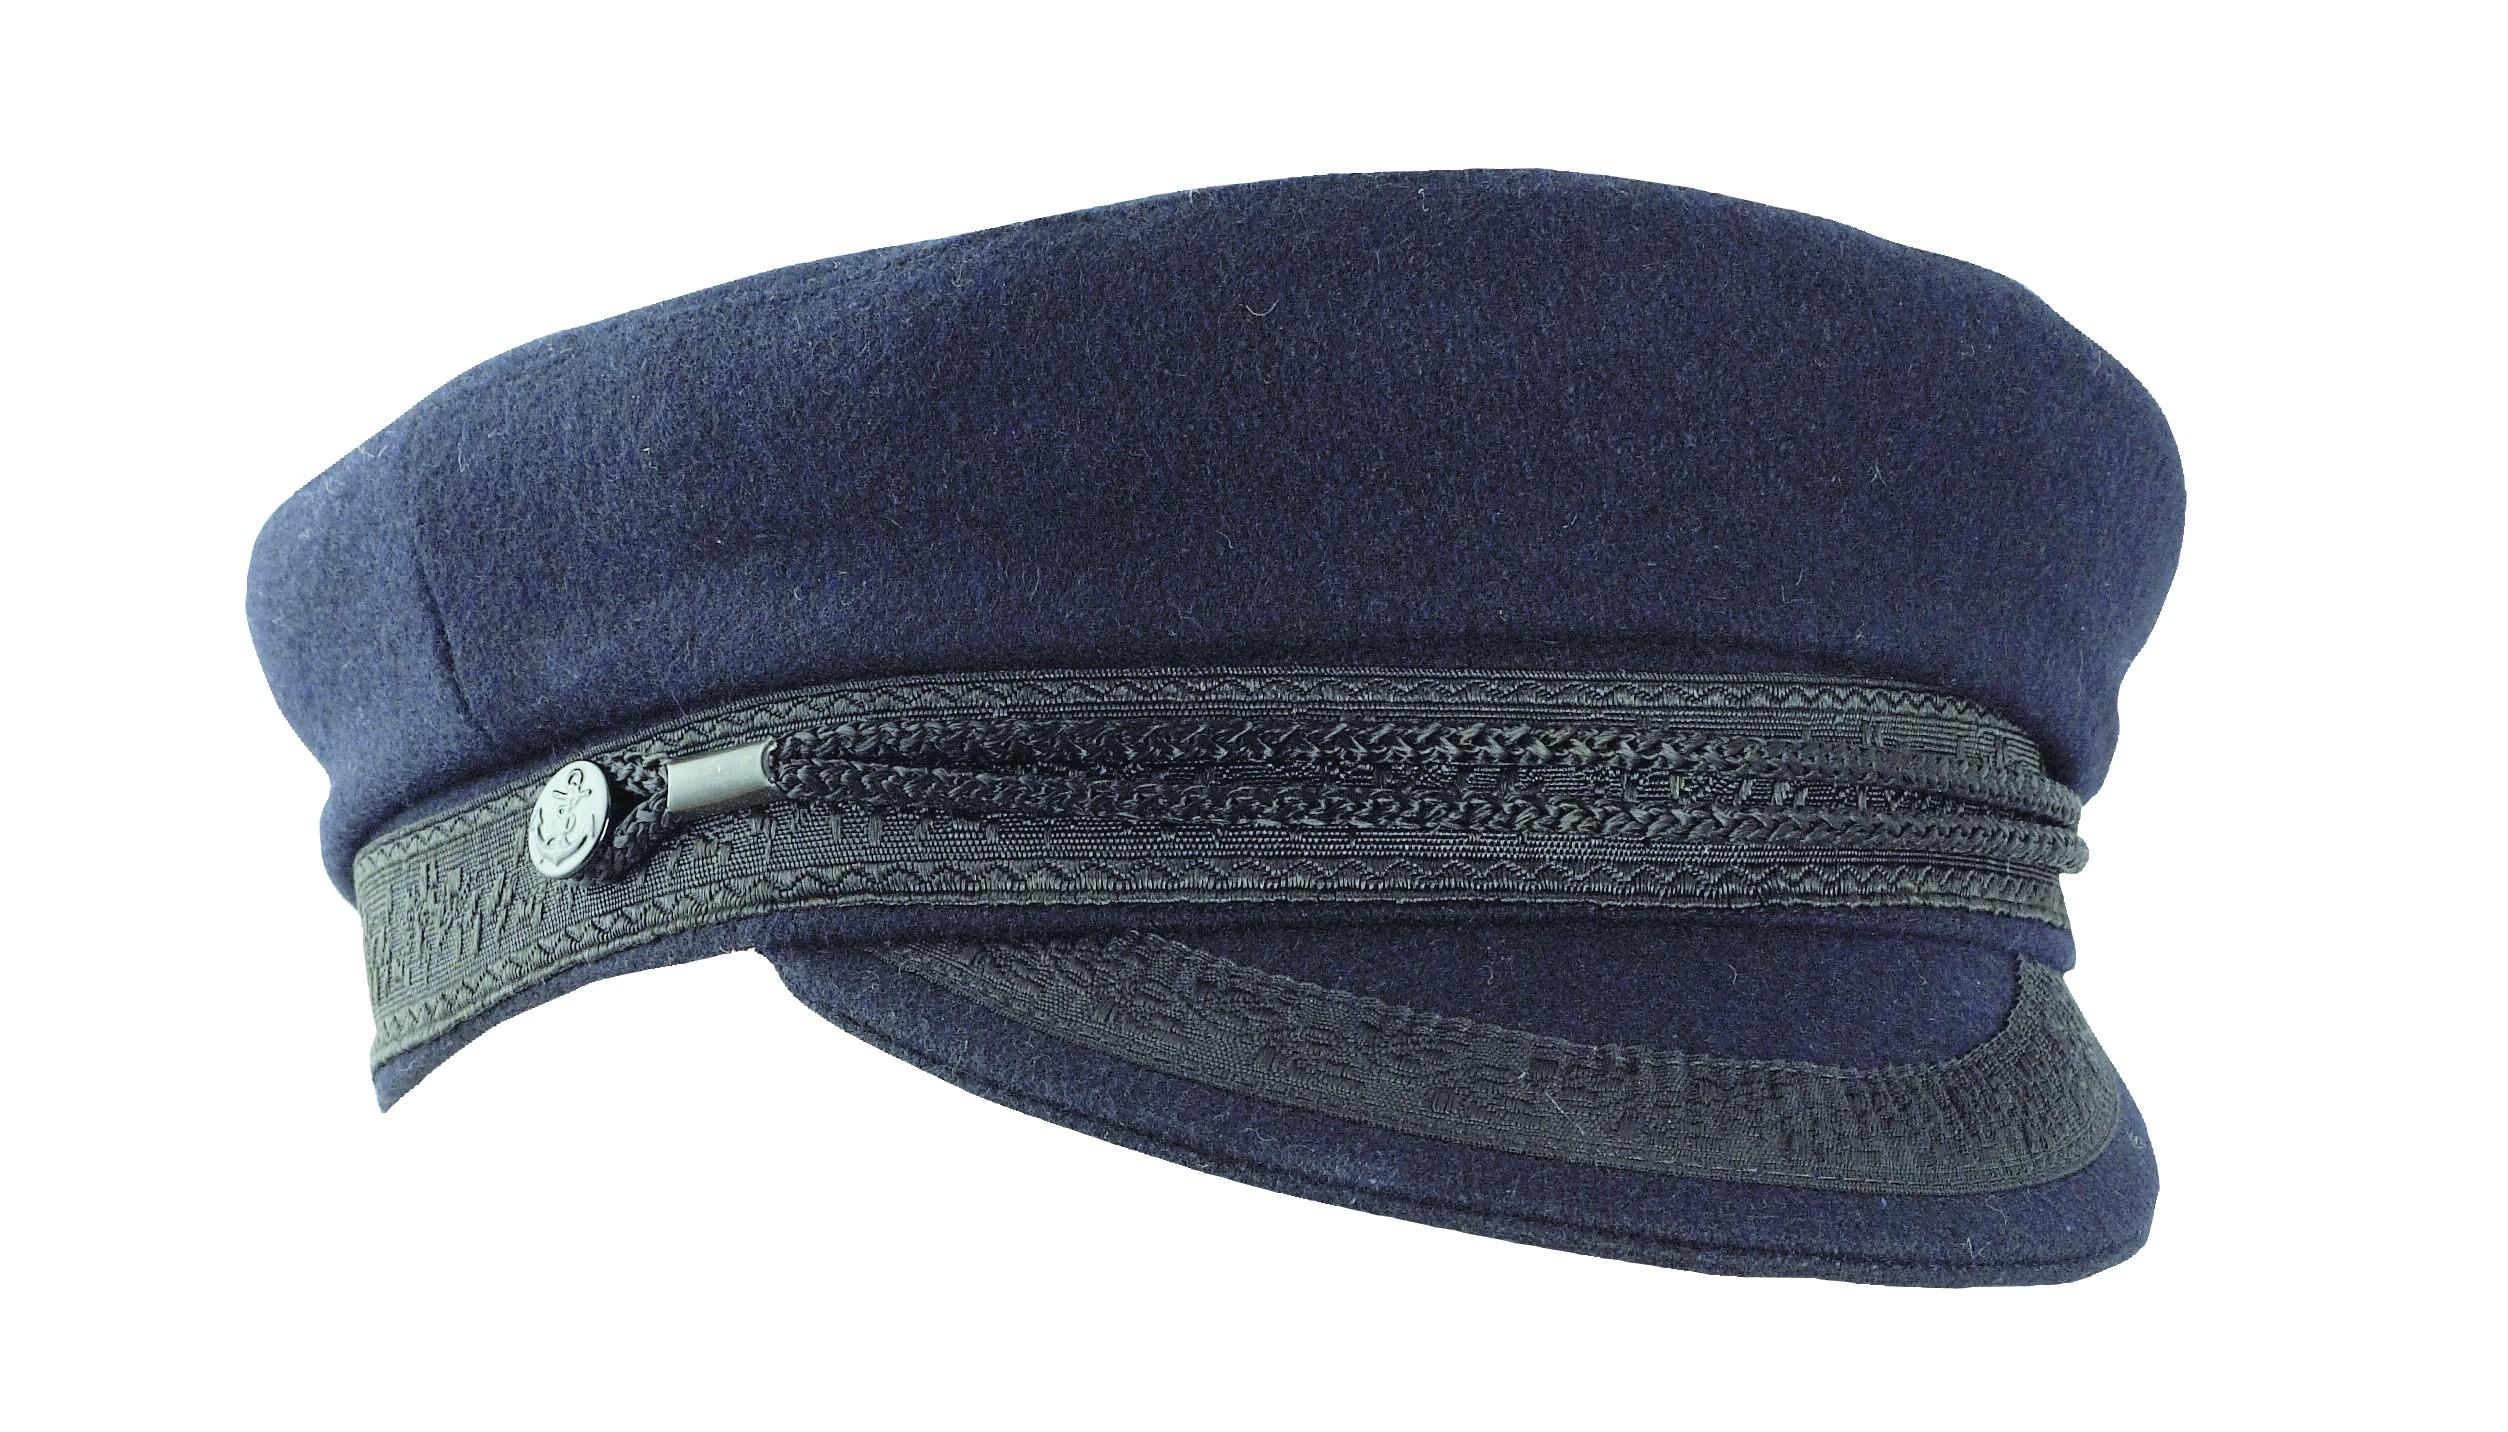 Casquette de marin Camaret tissu imperméable - Kausia f66b468bf5f